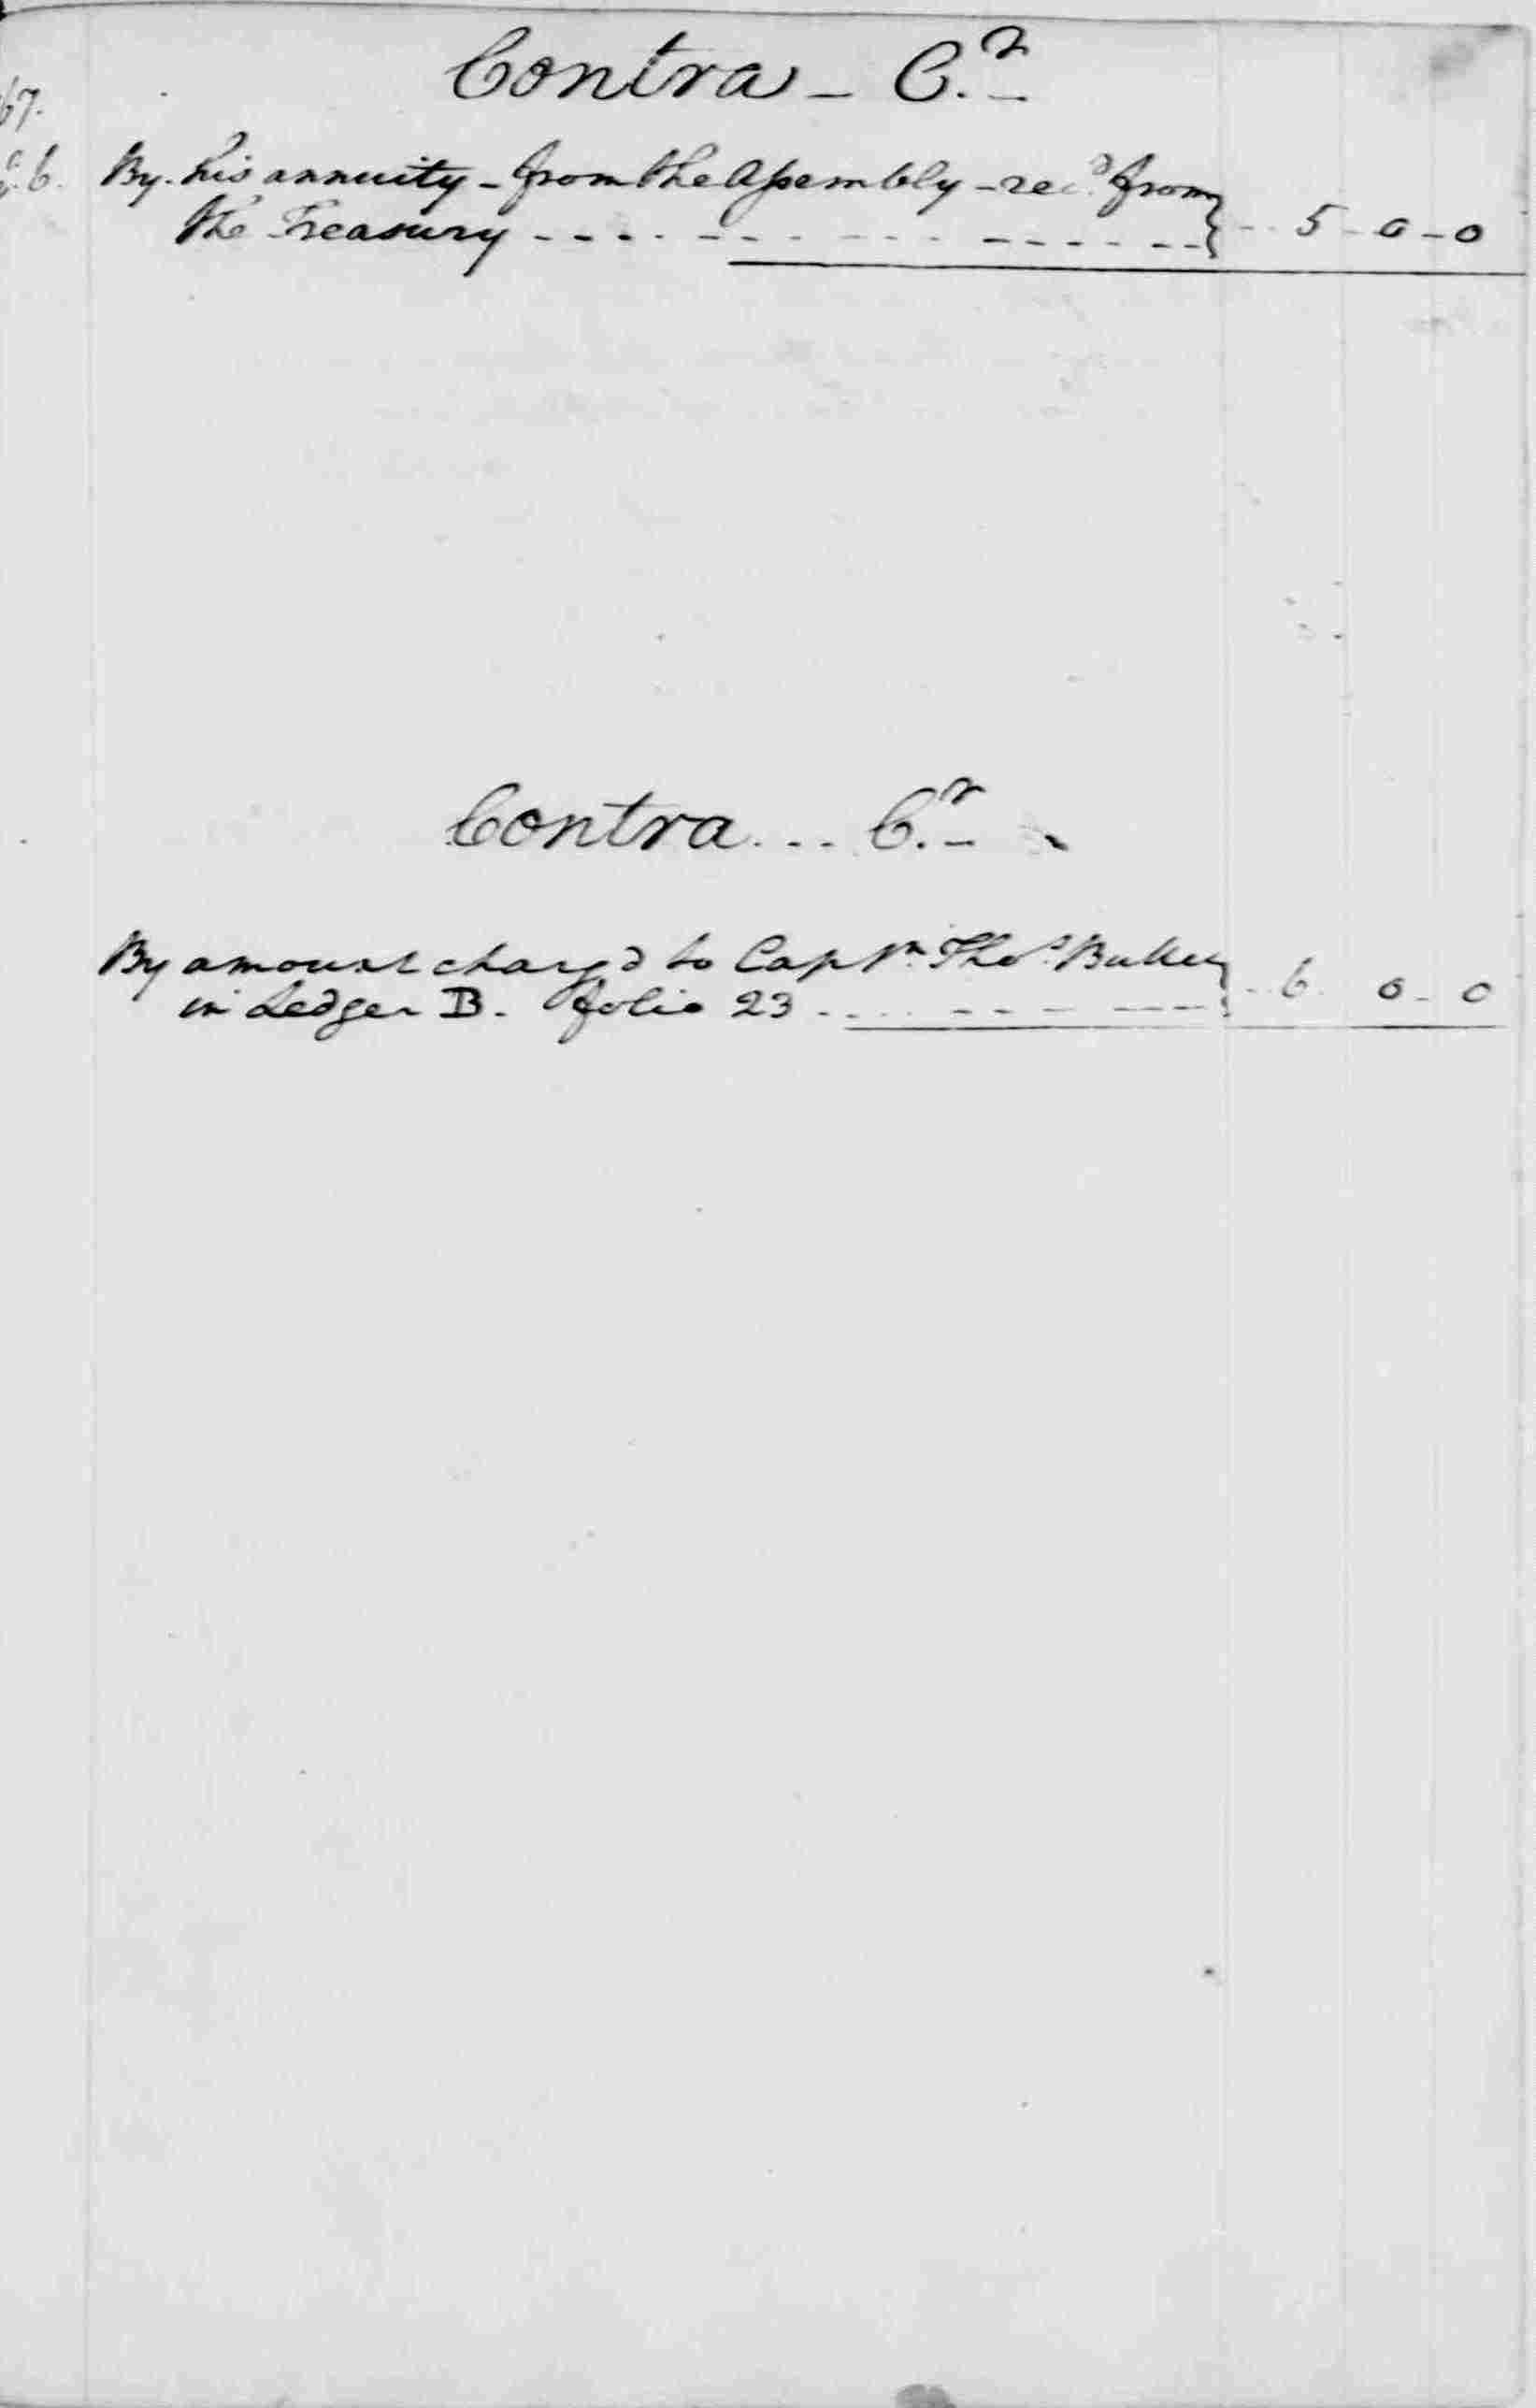 Ledger A, folio 264, right side